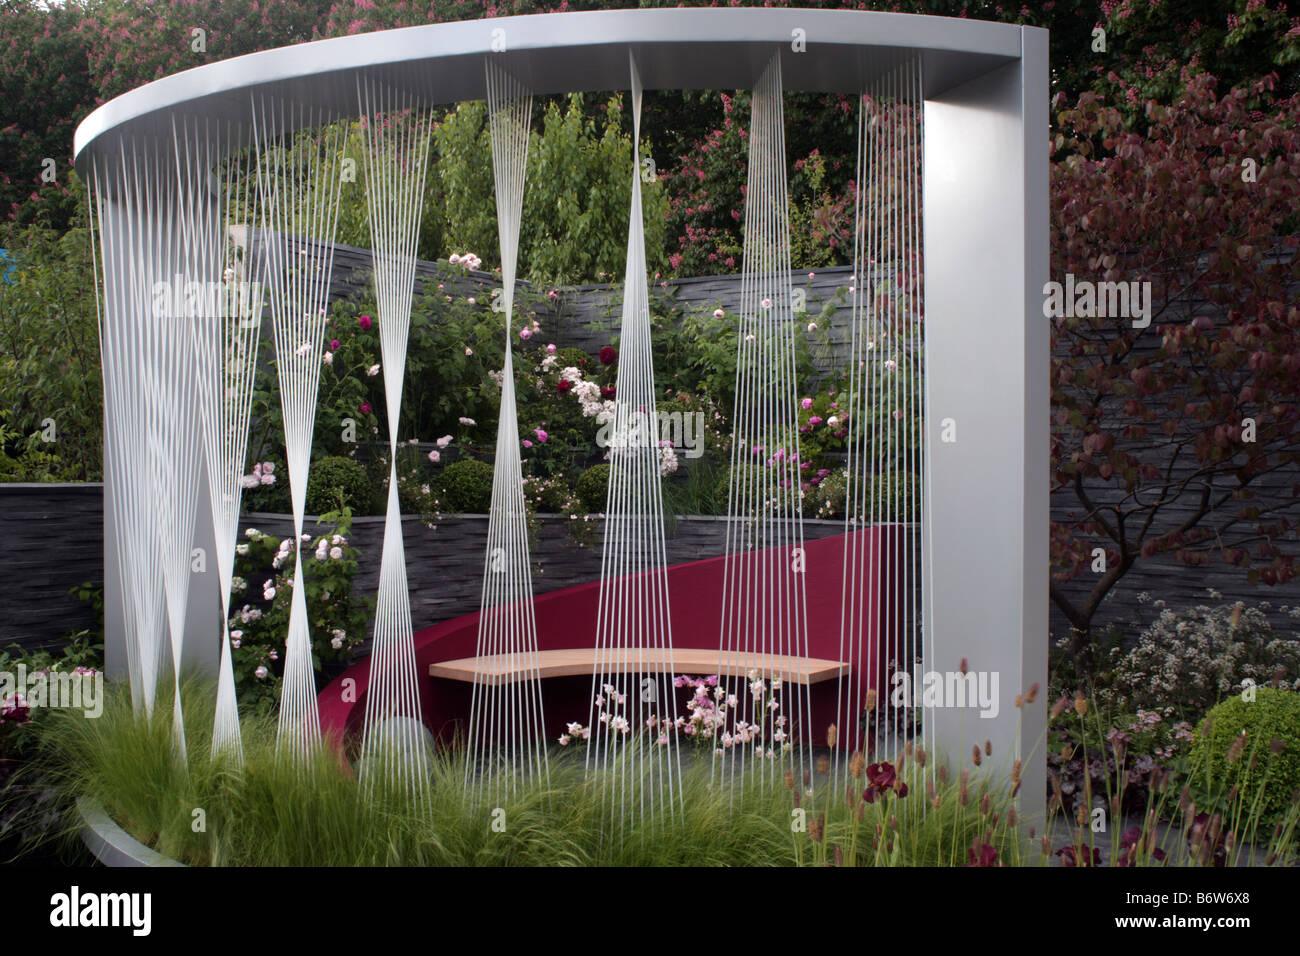 Show Garden by Rachel de Thame at RHS Chelsea Flower Show 2008 - Stock Image